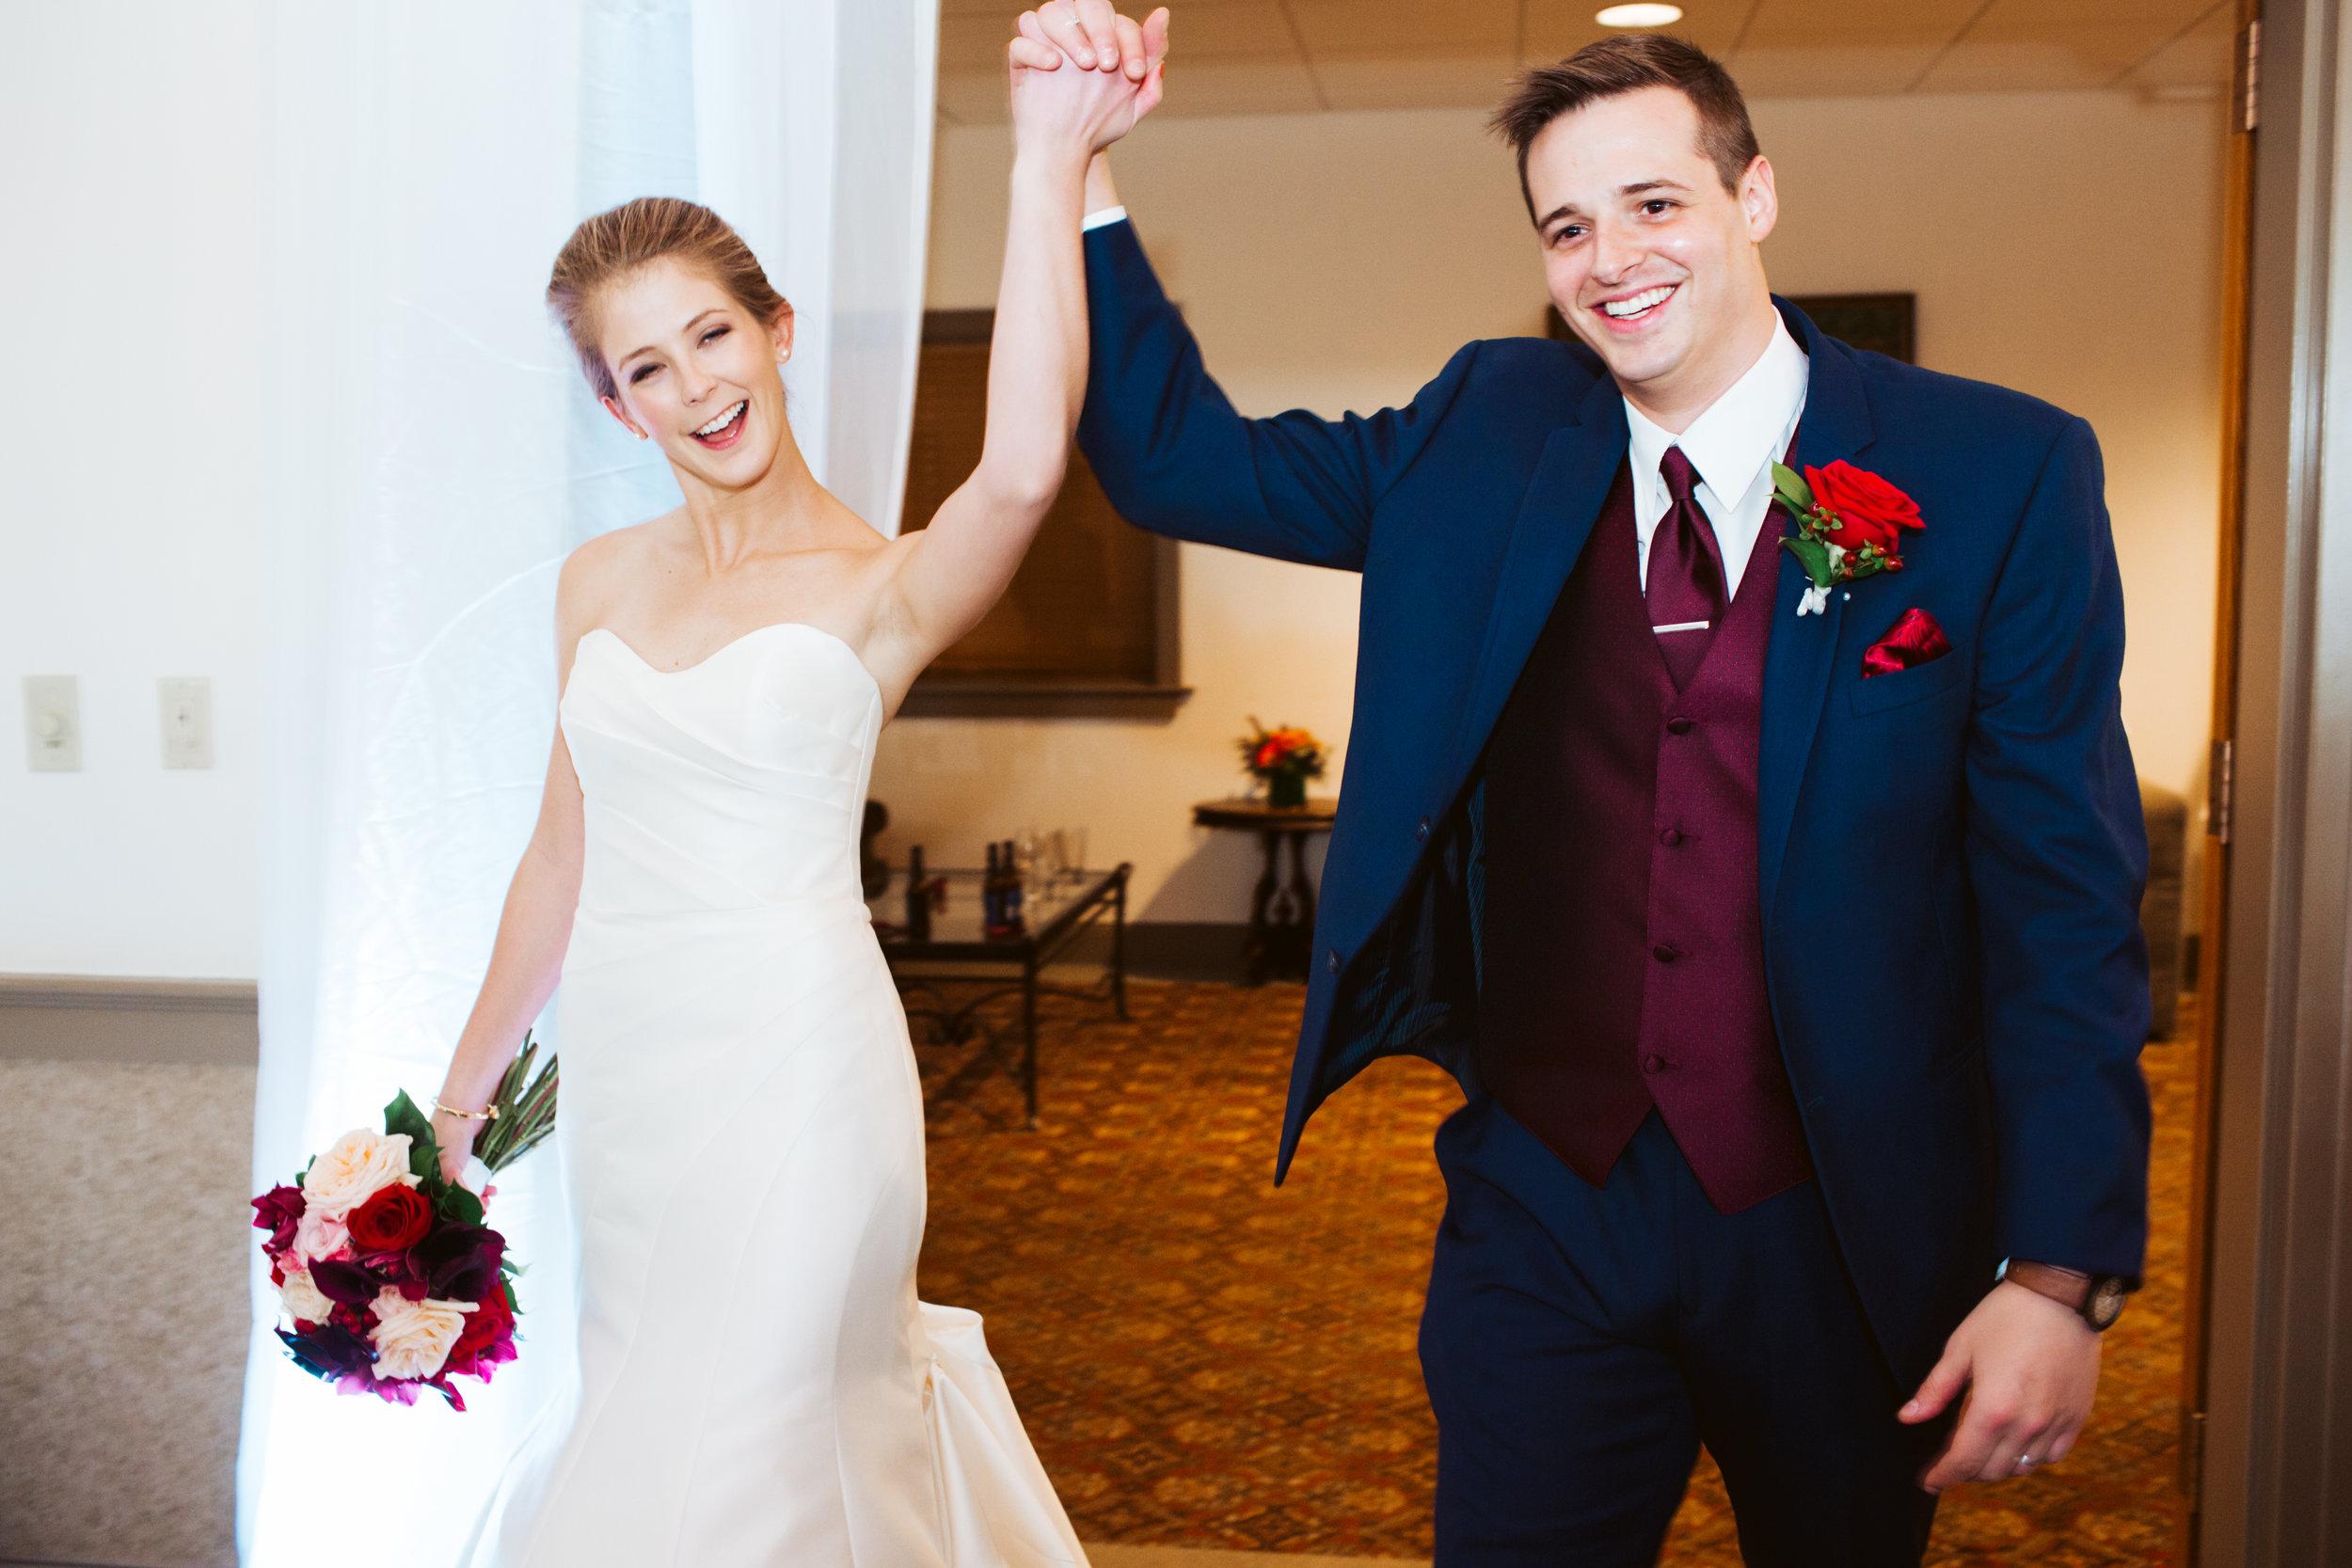 Jeff-and-Leslie-Wedding -8520.jpg